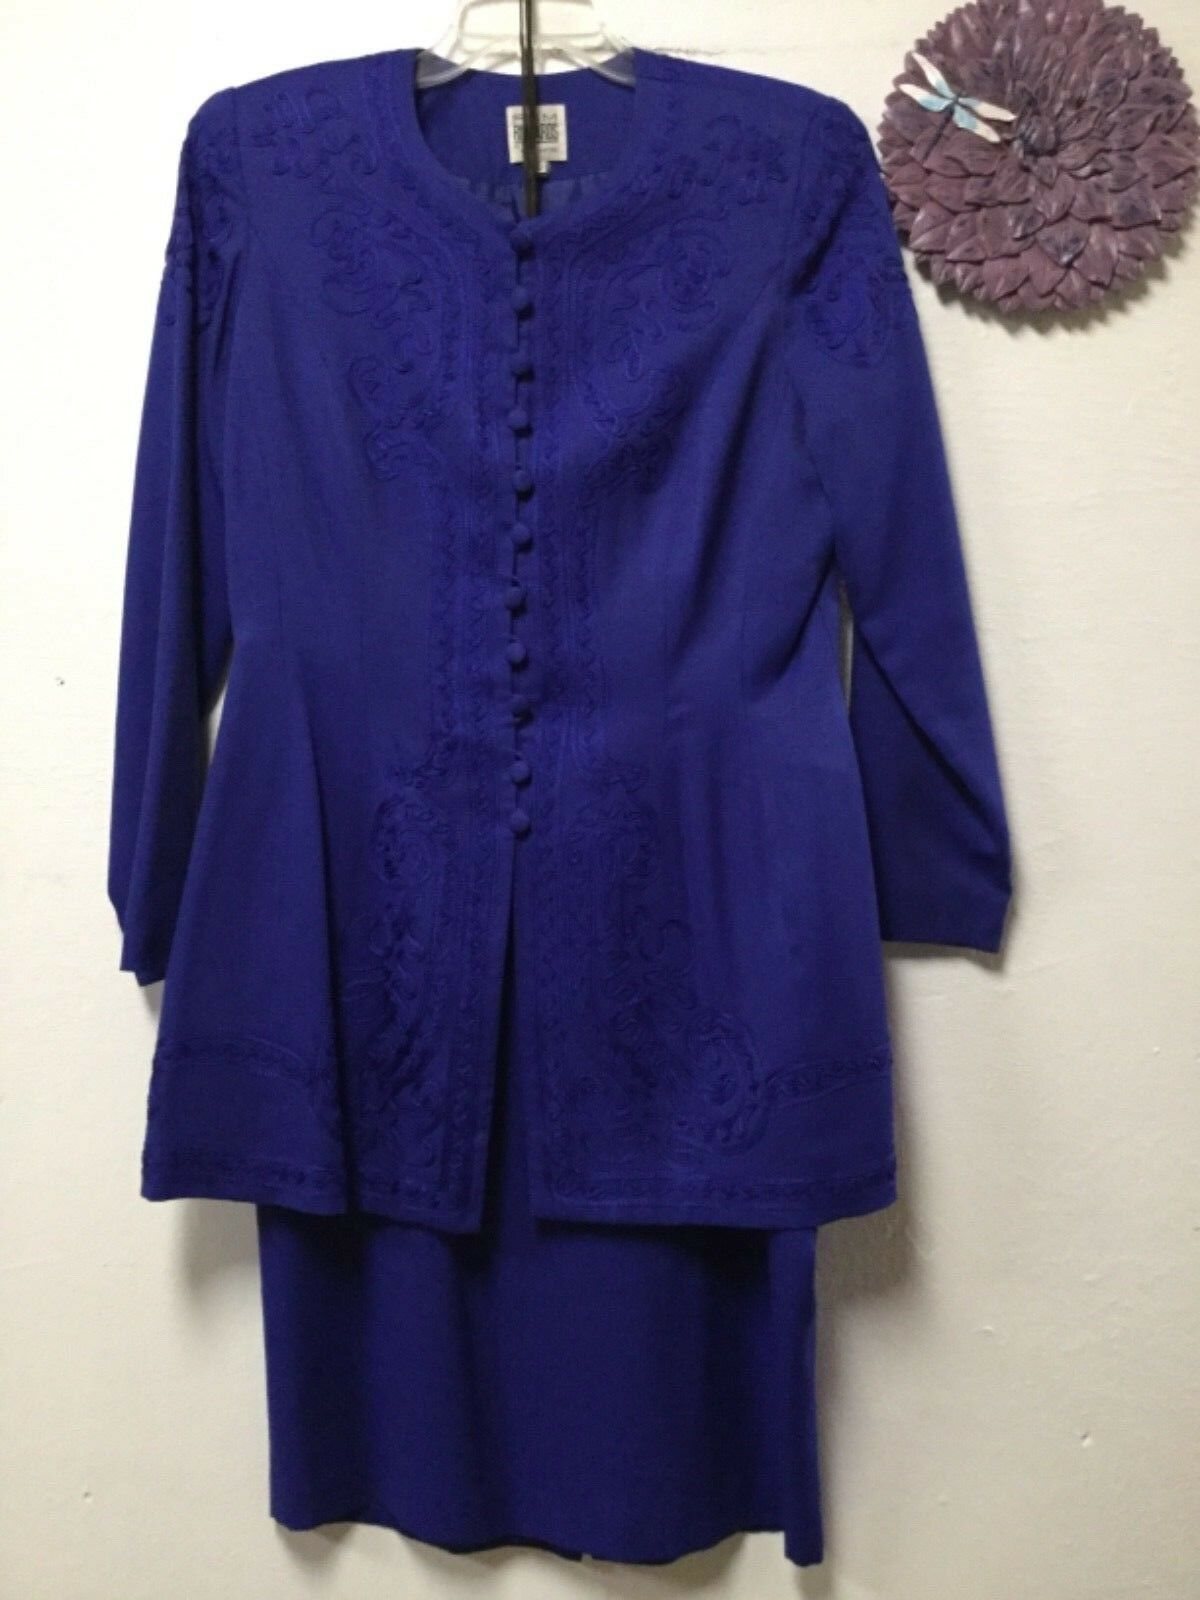 Ladies two piece formal skirt suit size 12 bluee decorative R&M Richards 20